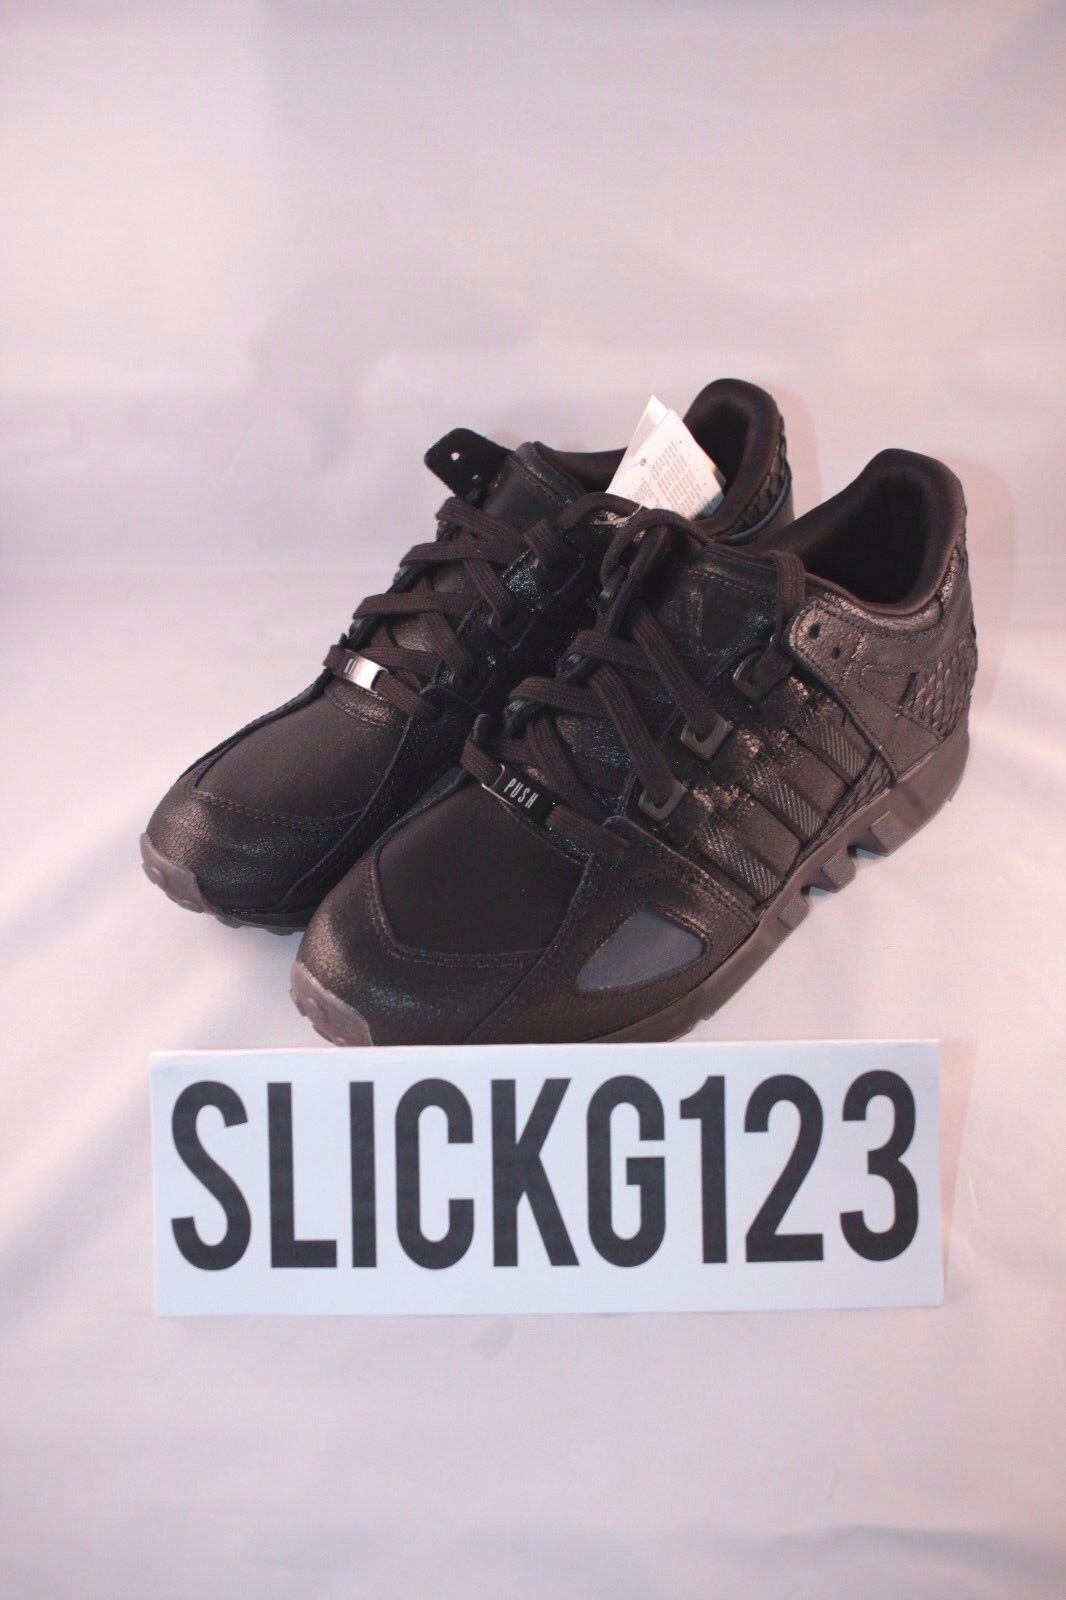 Adidas EQT Equipment Running Guidance 93 Pusha T Black Market Size 9 DS Brand Ne